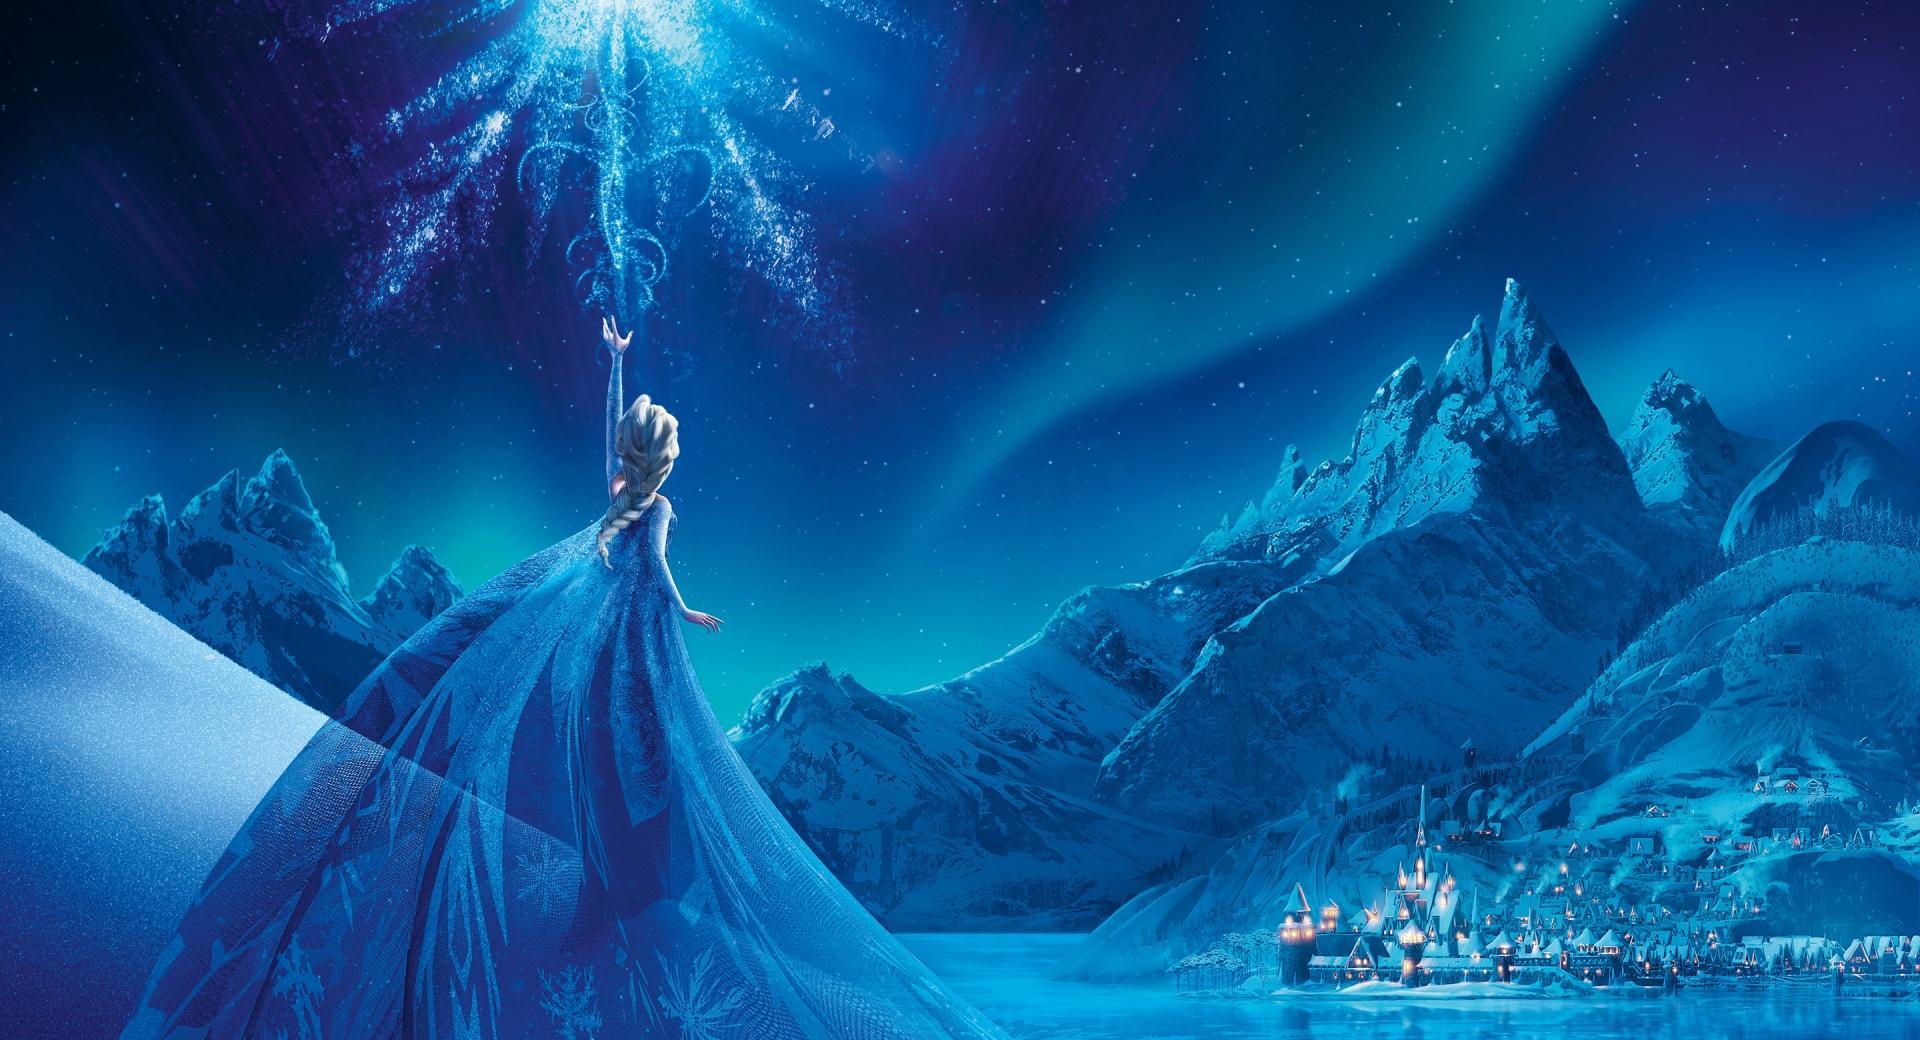 Elsa - Frozen wallpapers HD quality